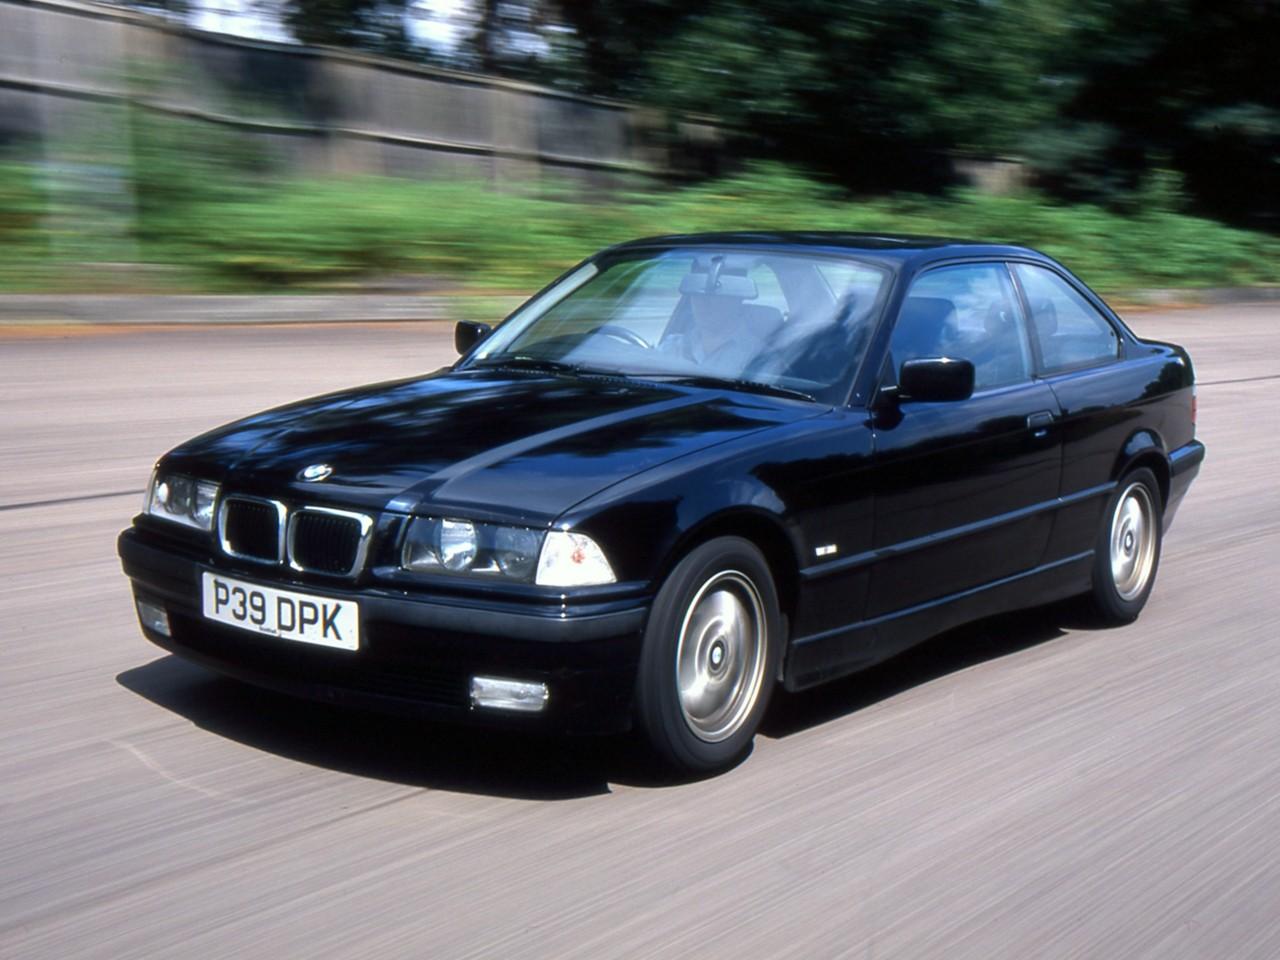 bmw 3 series coupe e36 1992 1993 1994 1995 1996 1997 1998 autoevolution. Black Bedroom Furniture Sets. Home Design Ideas